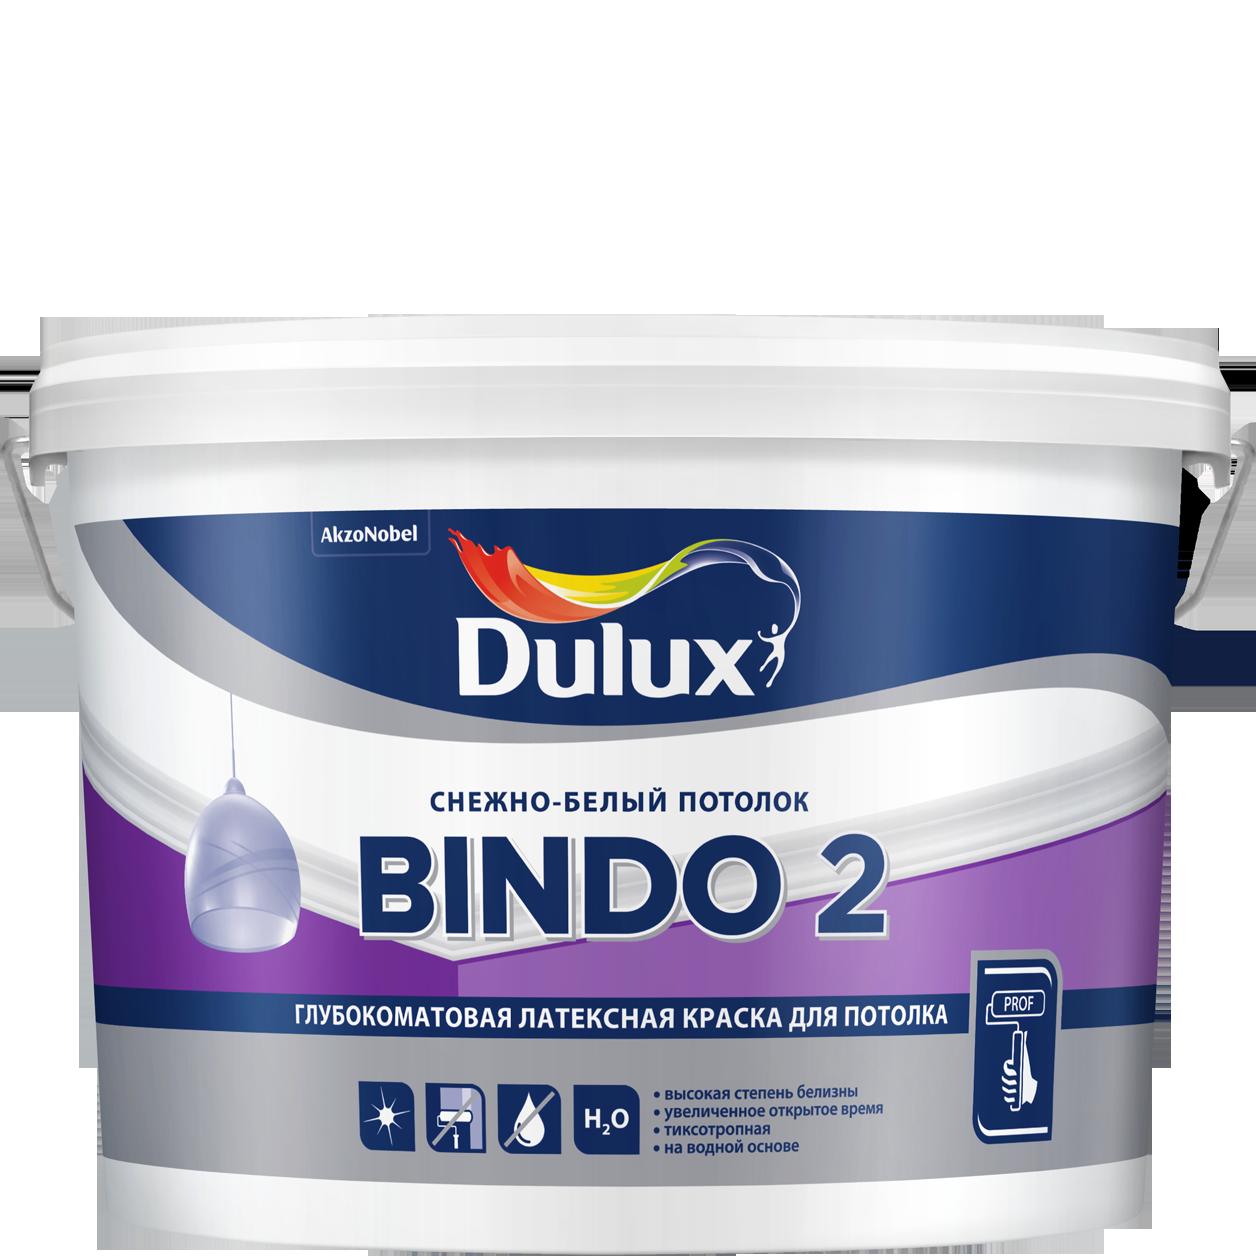 Краска Dulux Bindo 2 латексная глубокоматовая краска для потолка